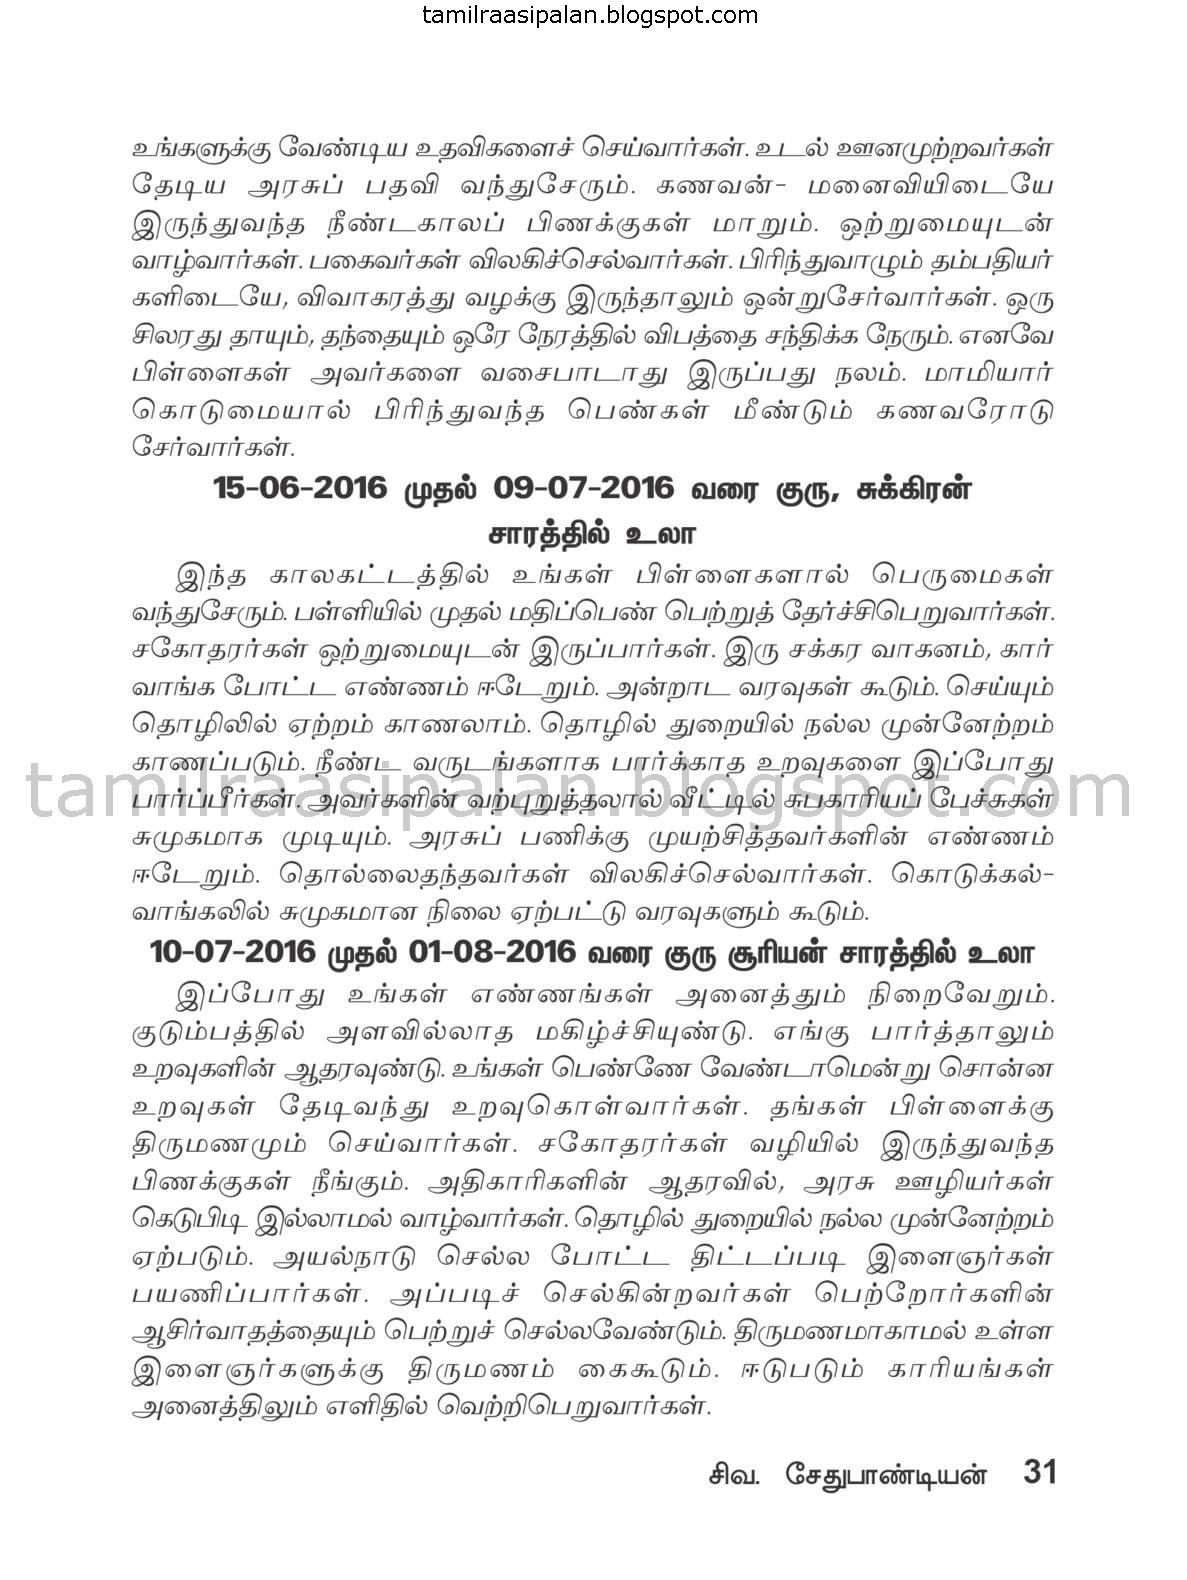 Kadakam Guru Peyarchi Palan-2015-2016 Free Online